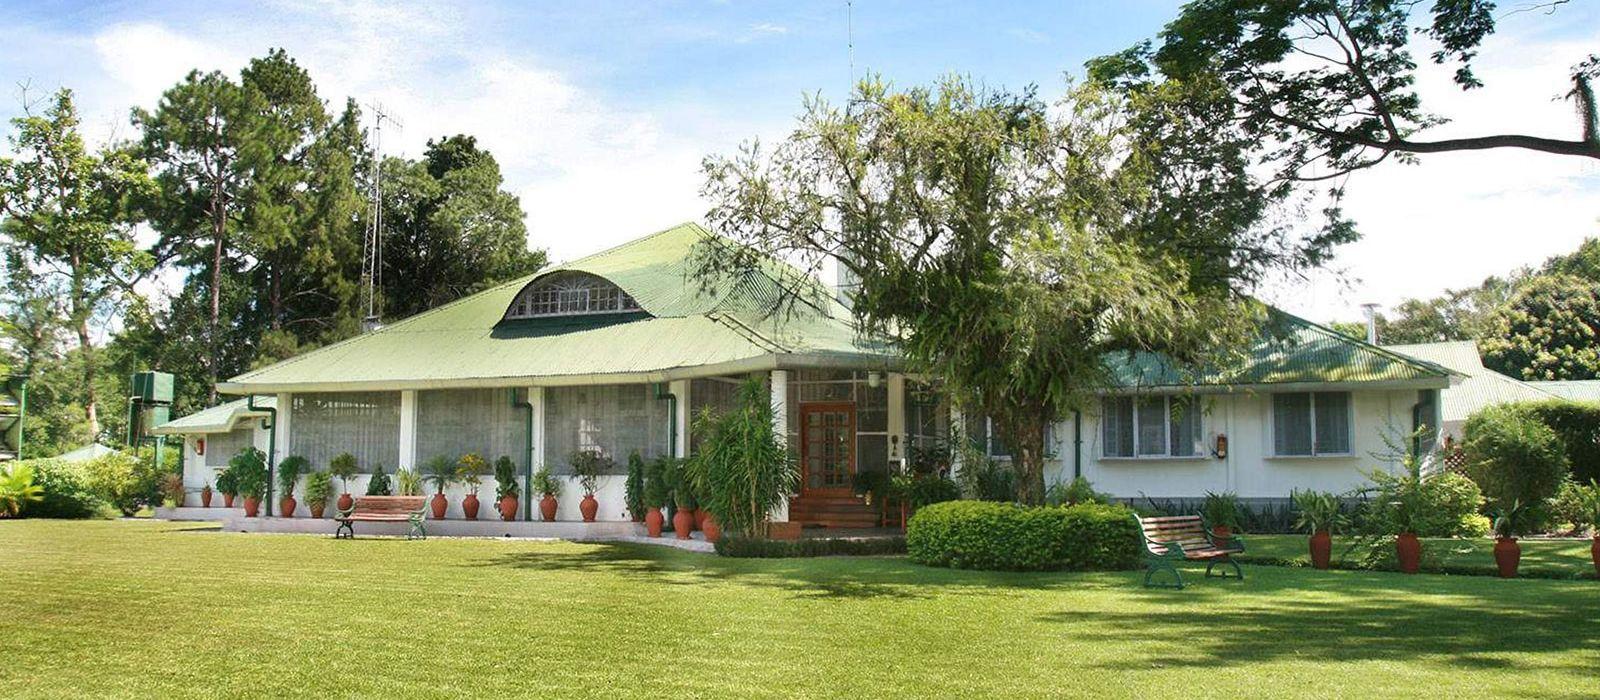 Hotel Wild Mahseer Heritage Bungalow East India